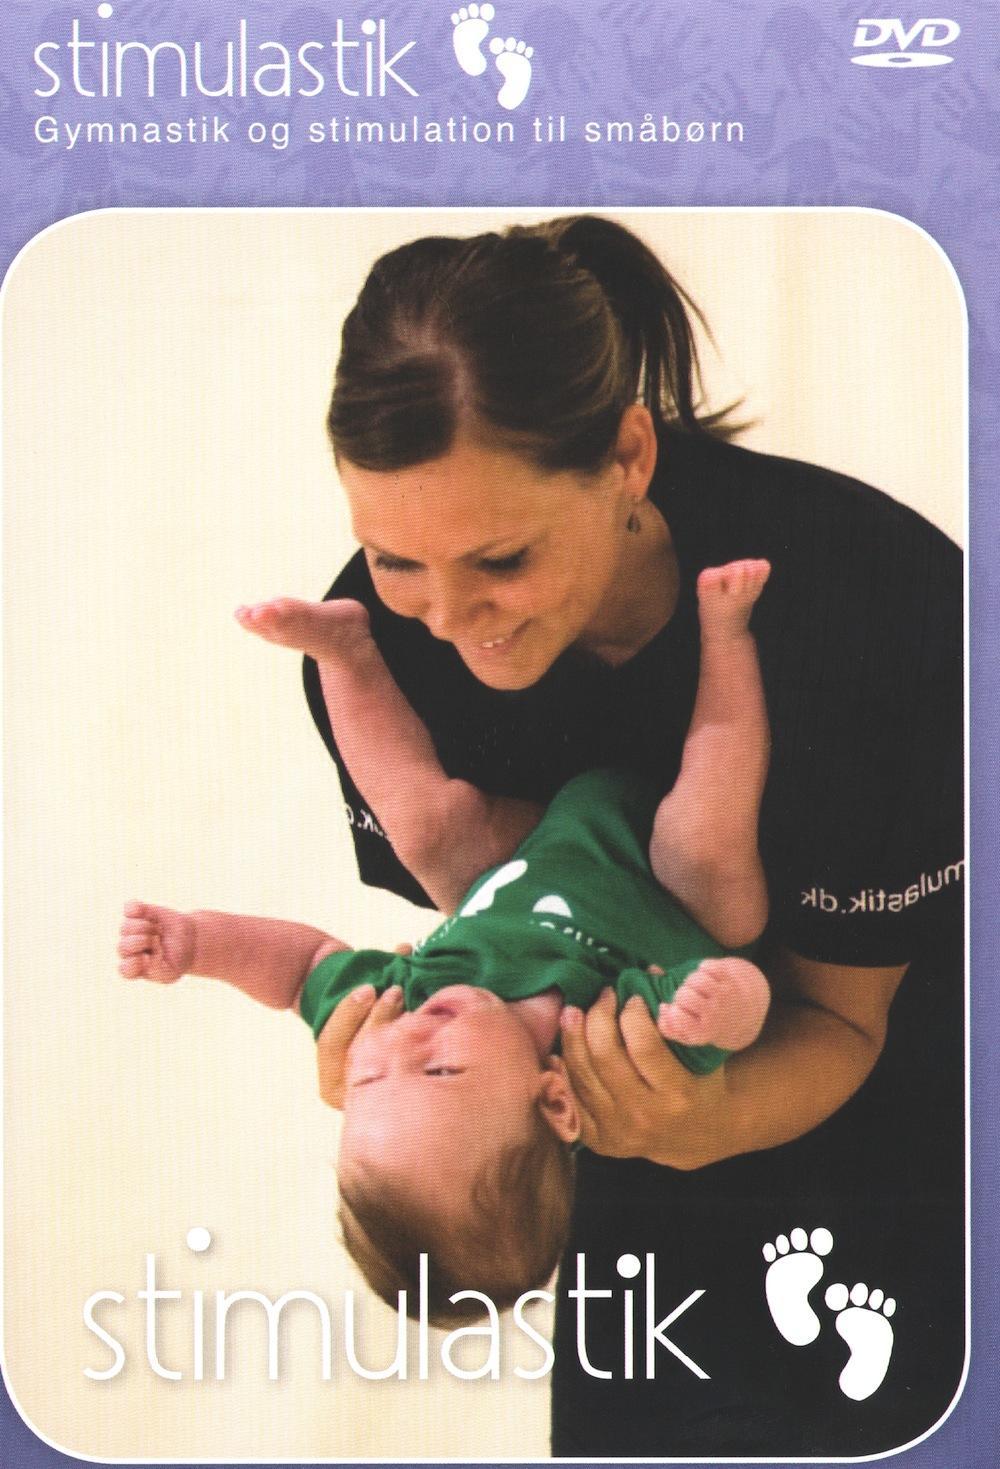 Stimulastik - Gymnastik og stimulation til småbørn